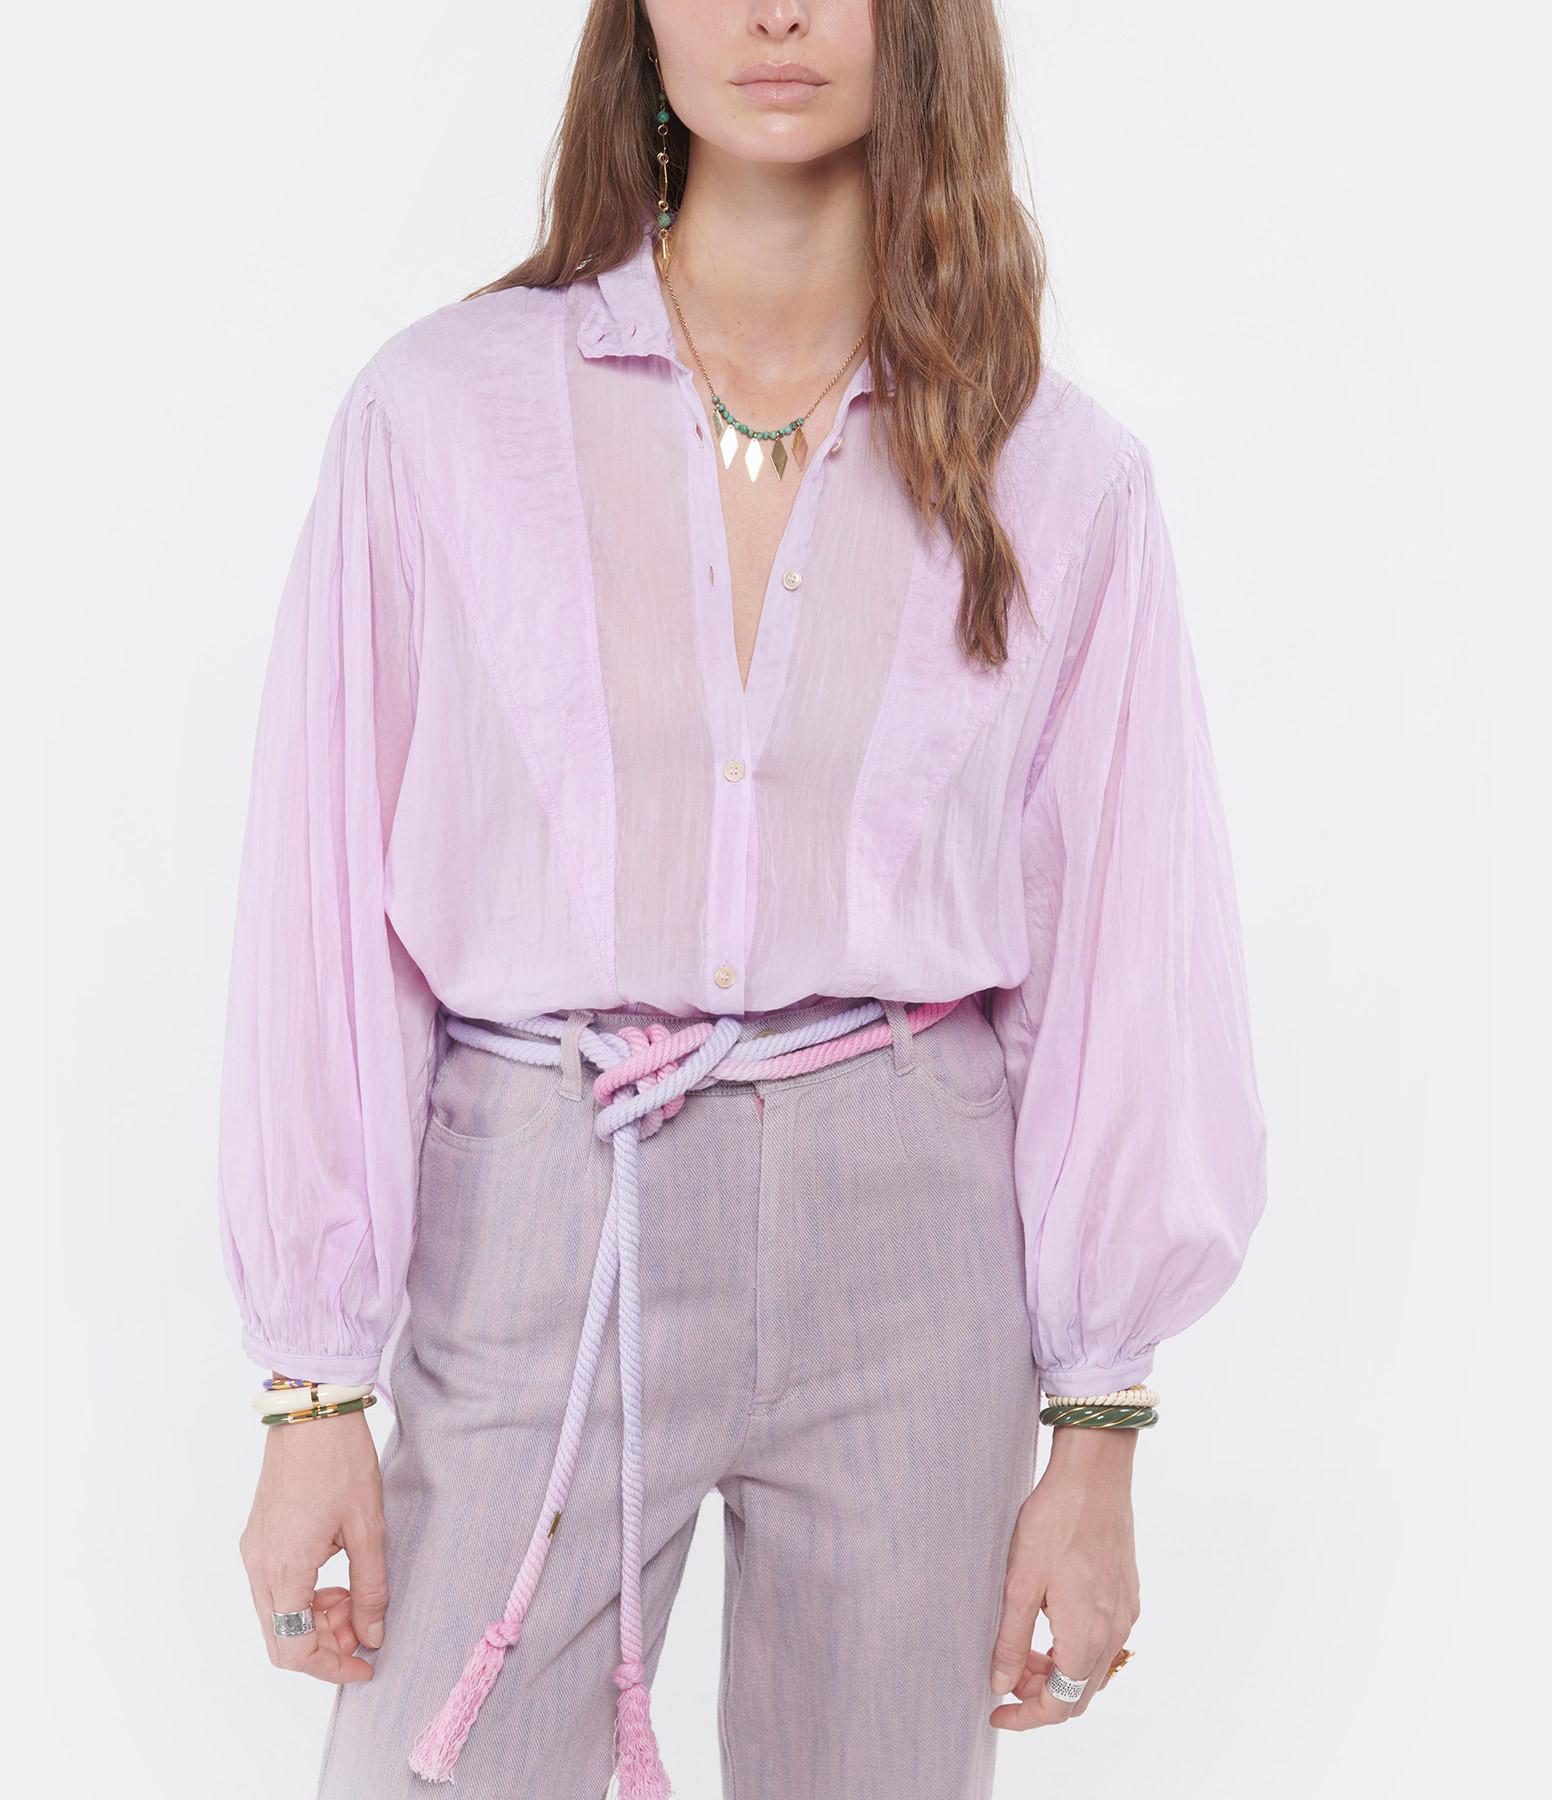 ISABEL MARANT - Ceinture Lyma Coton Tie and Dye Rose